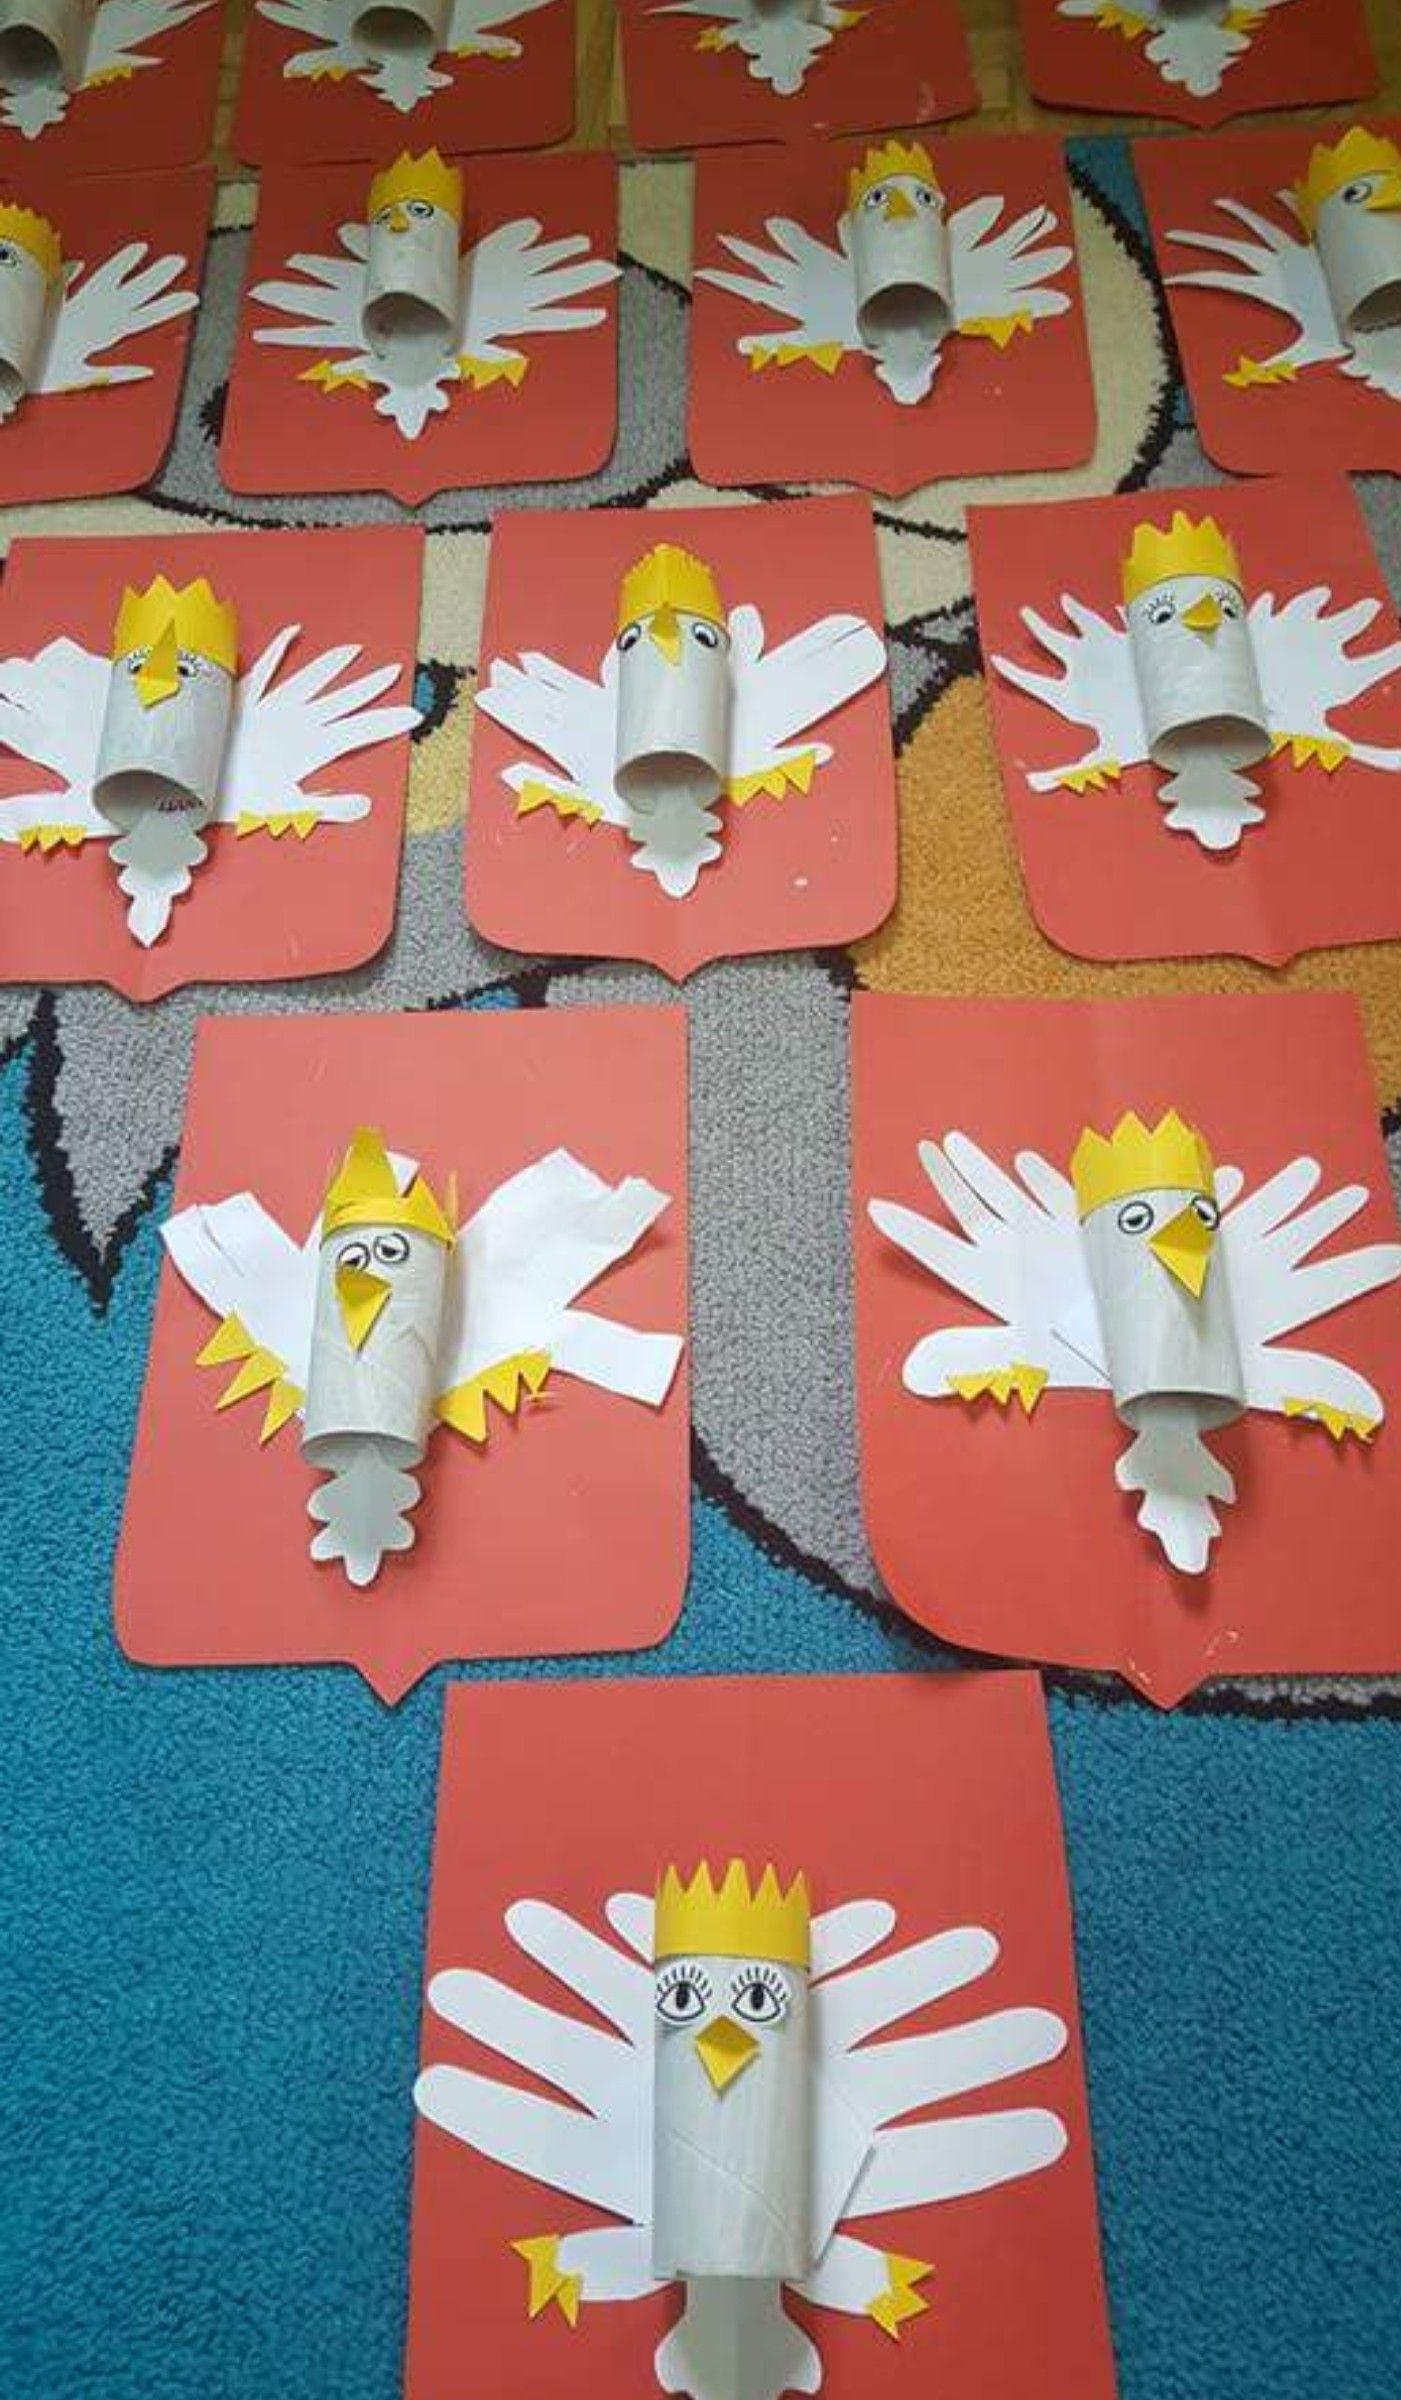 Godlo Polski Spring Crafts For Kids Valentine Crafts For Kids Art For Kids